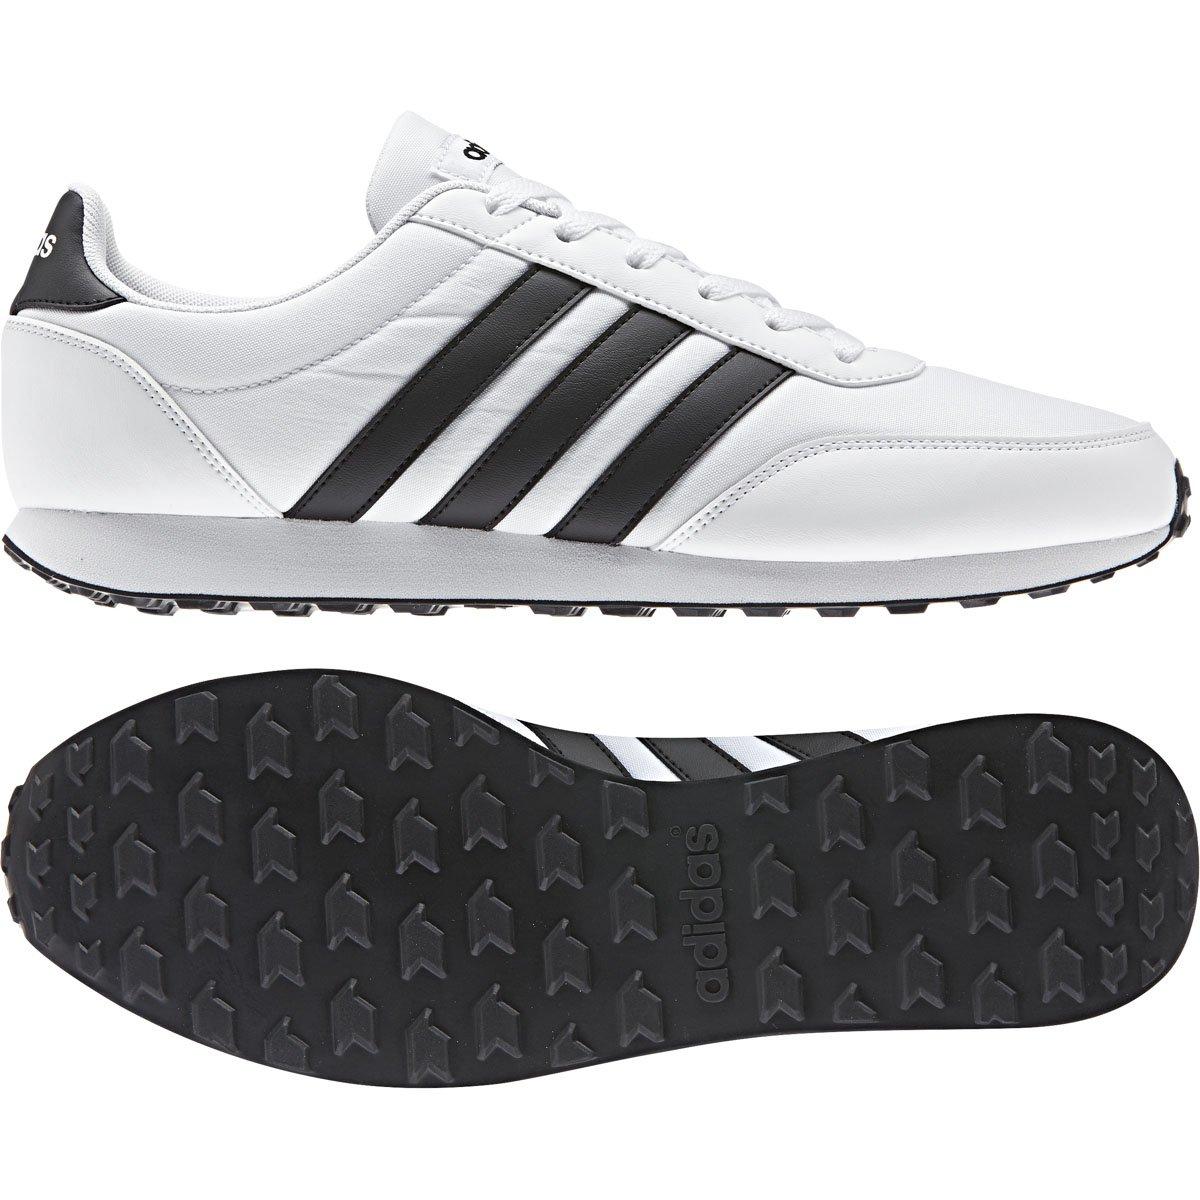 987918cd69d ... order tenis casual neo v racer 2.0 adidas caballero. sku 80155462 marca  adidas c 28d51 ...